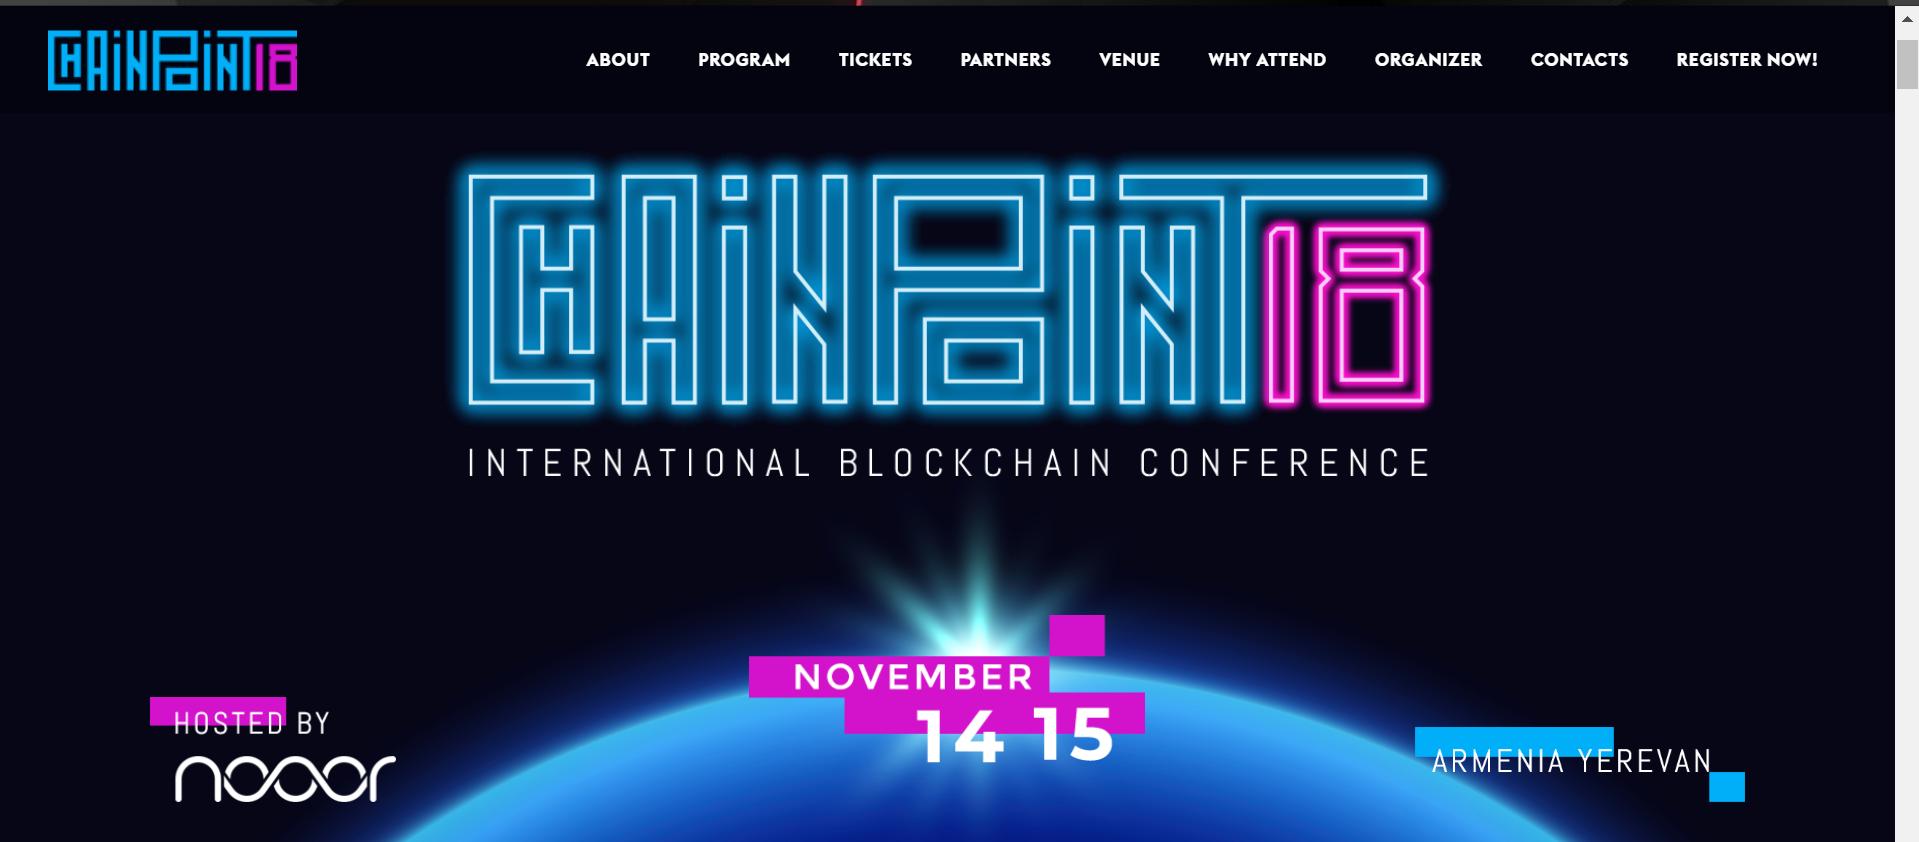 ChainPoint'18 - International Blockchain Conference